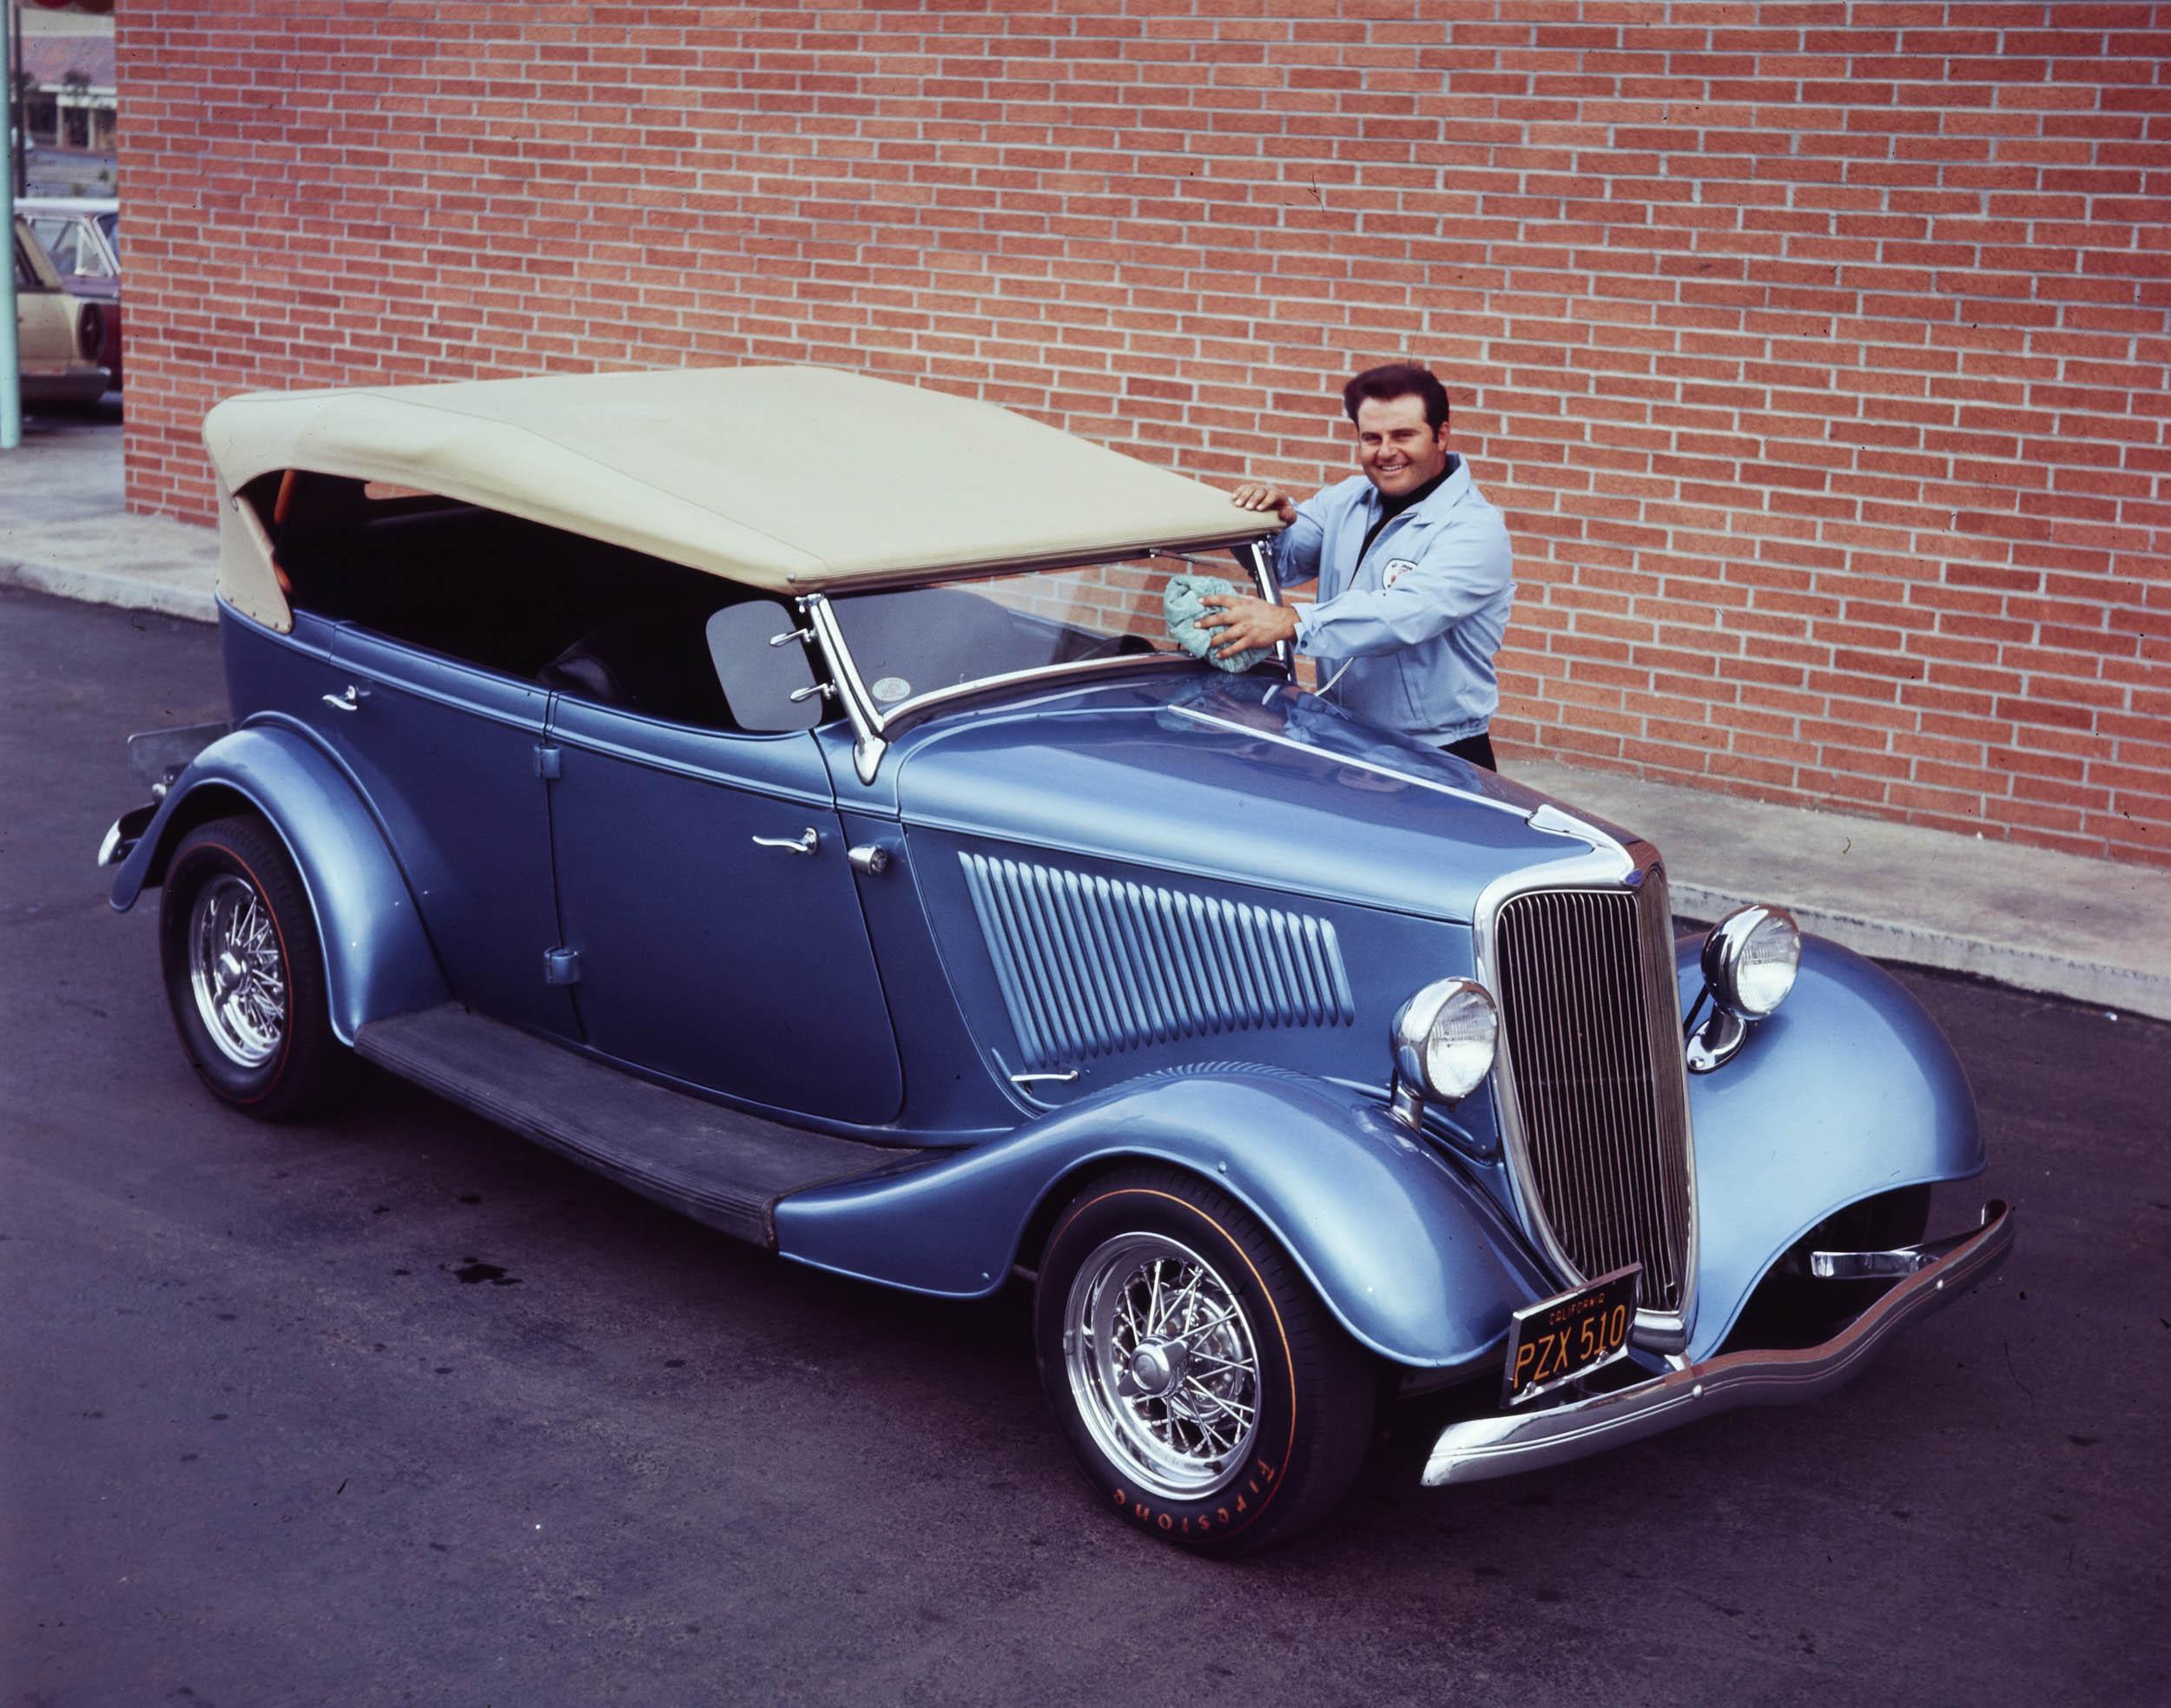 Olds-powered 1934 Ford phaeton